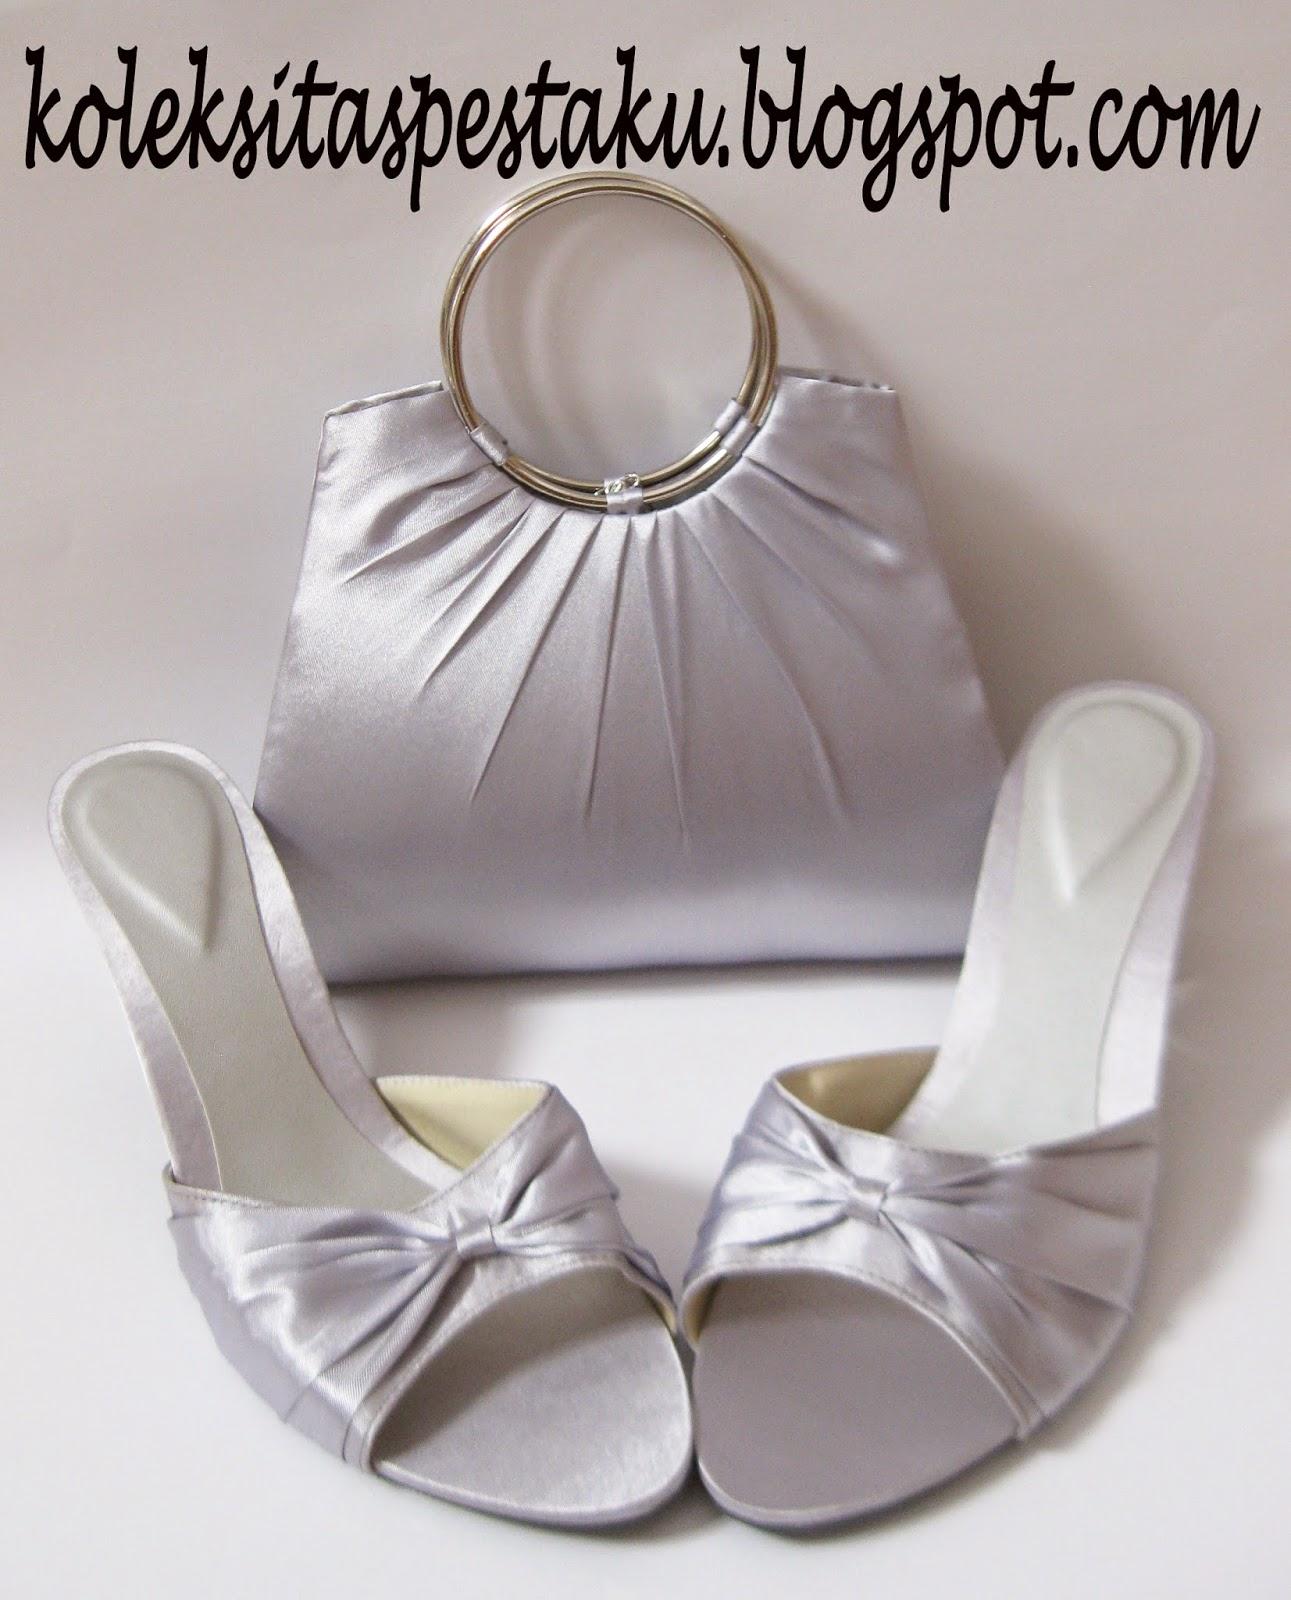 Sepatu Pesta Mewah dan Tas Pesta Mewah Silver Cocok BuatSeserahan Atau Hantaran